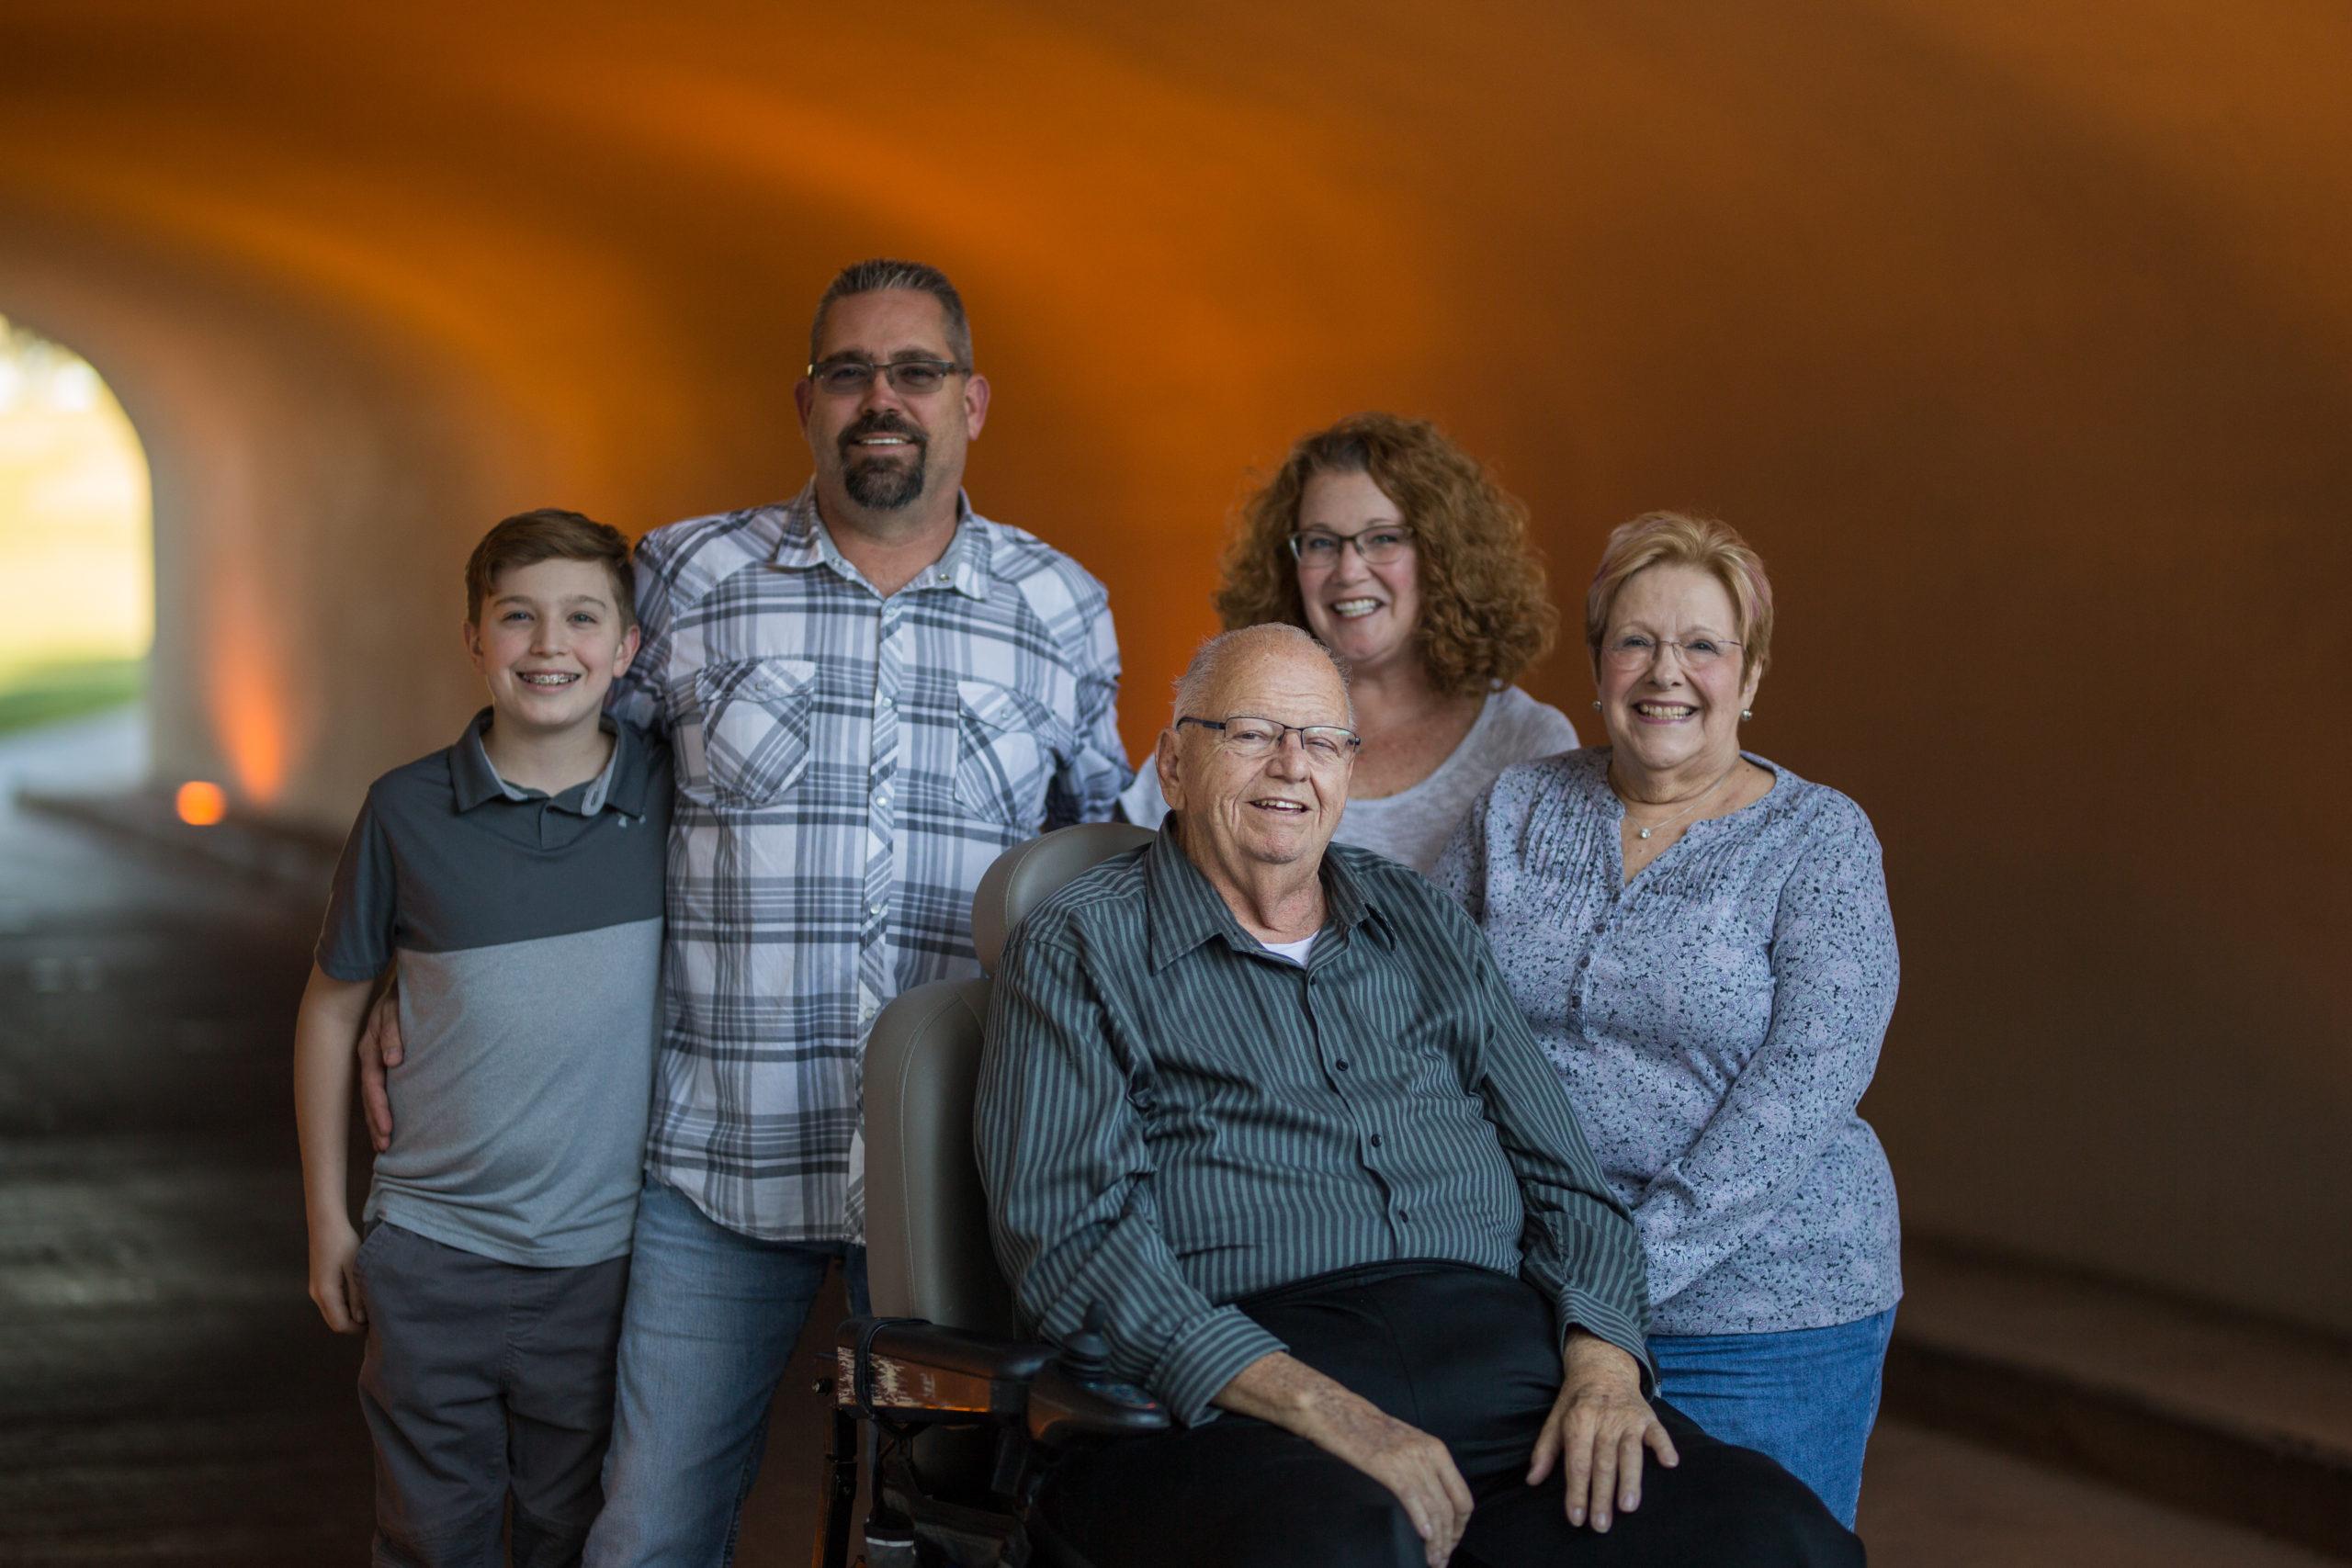 Family Portrait Session - The Margita Family